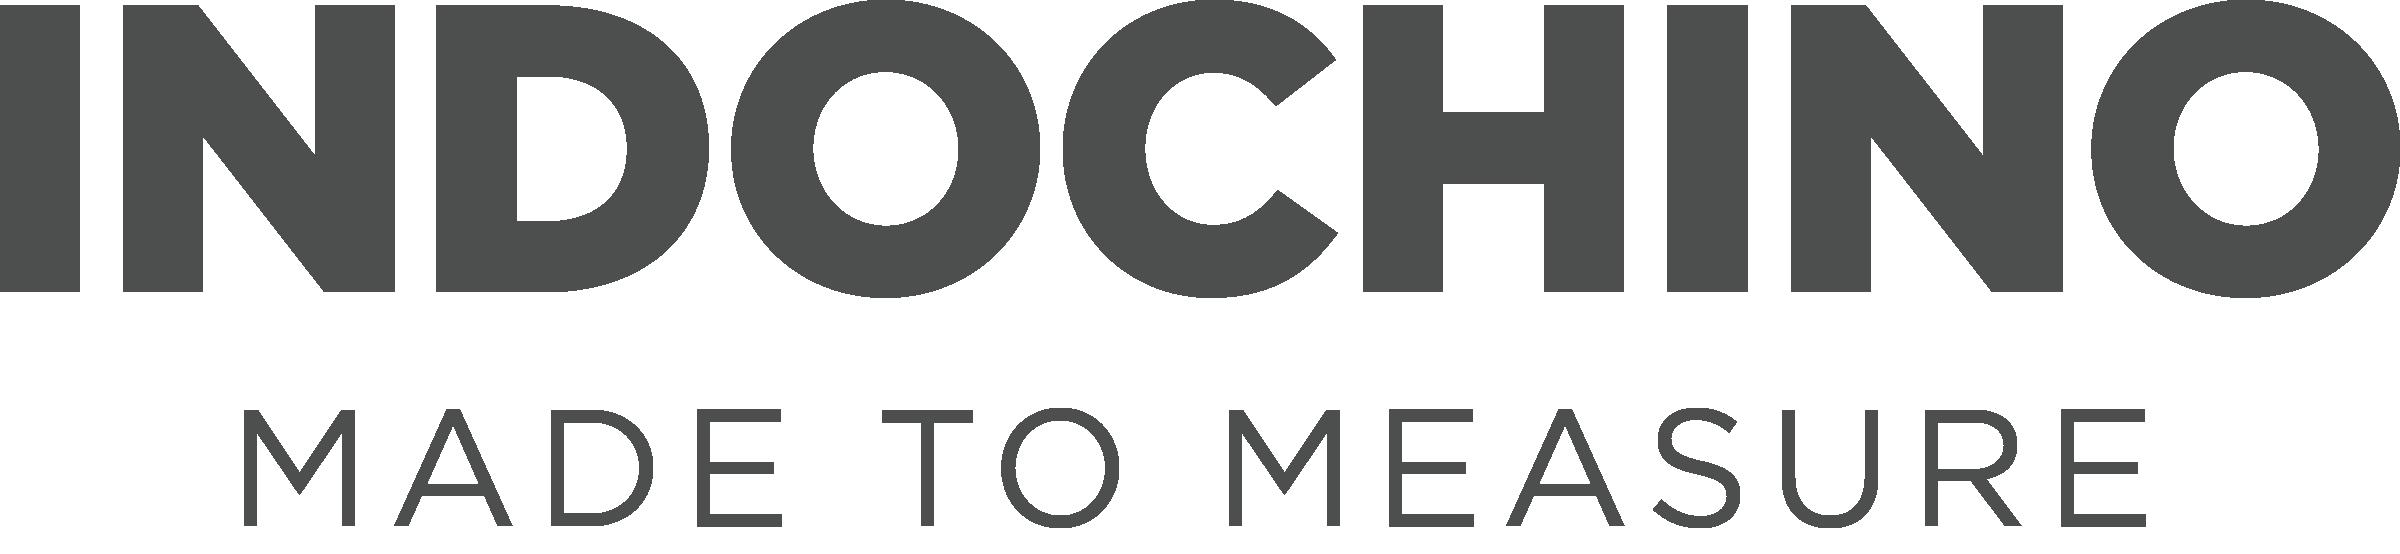 indochino_logo.png